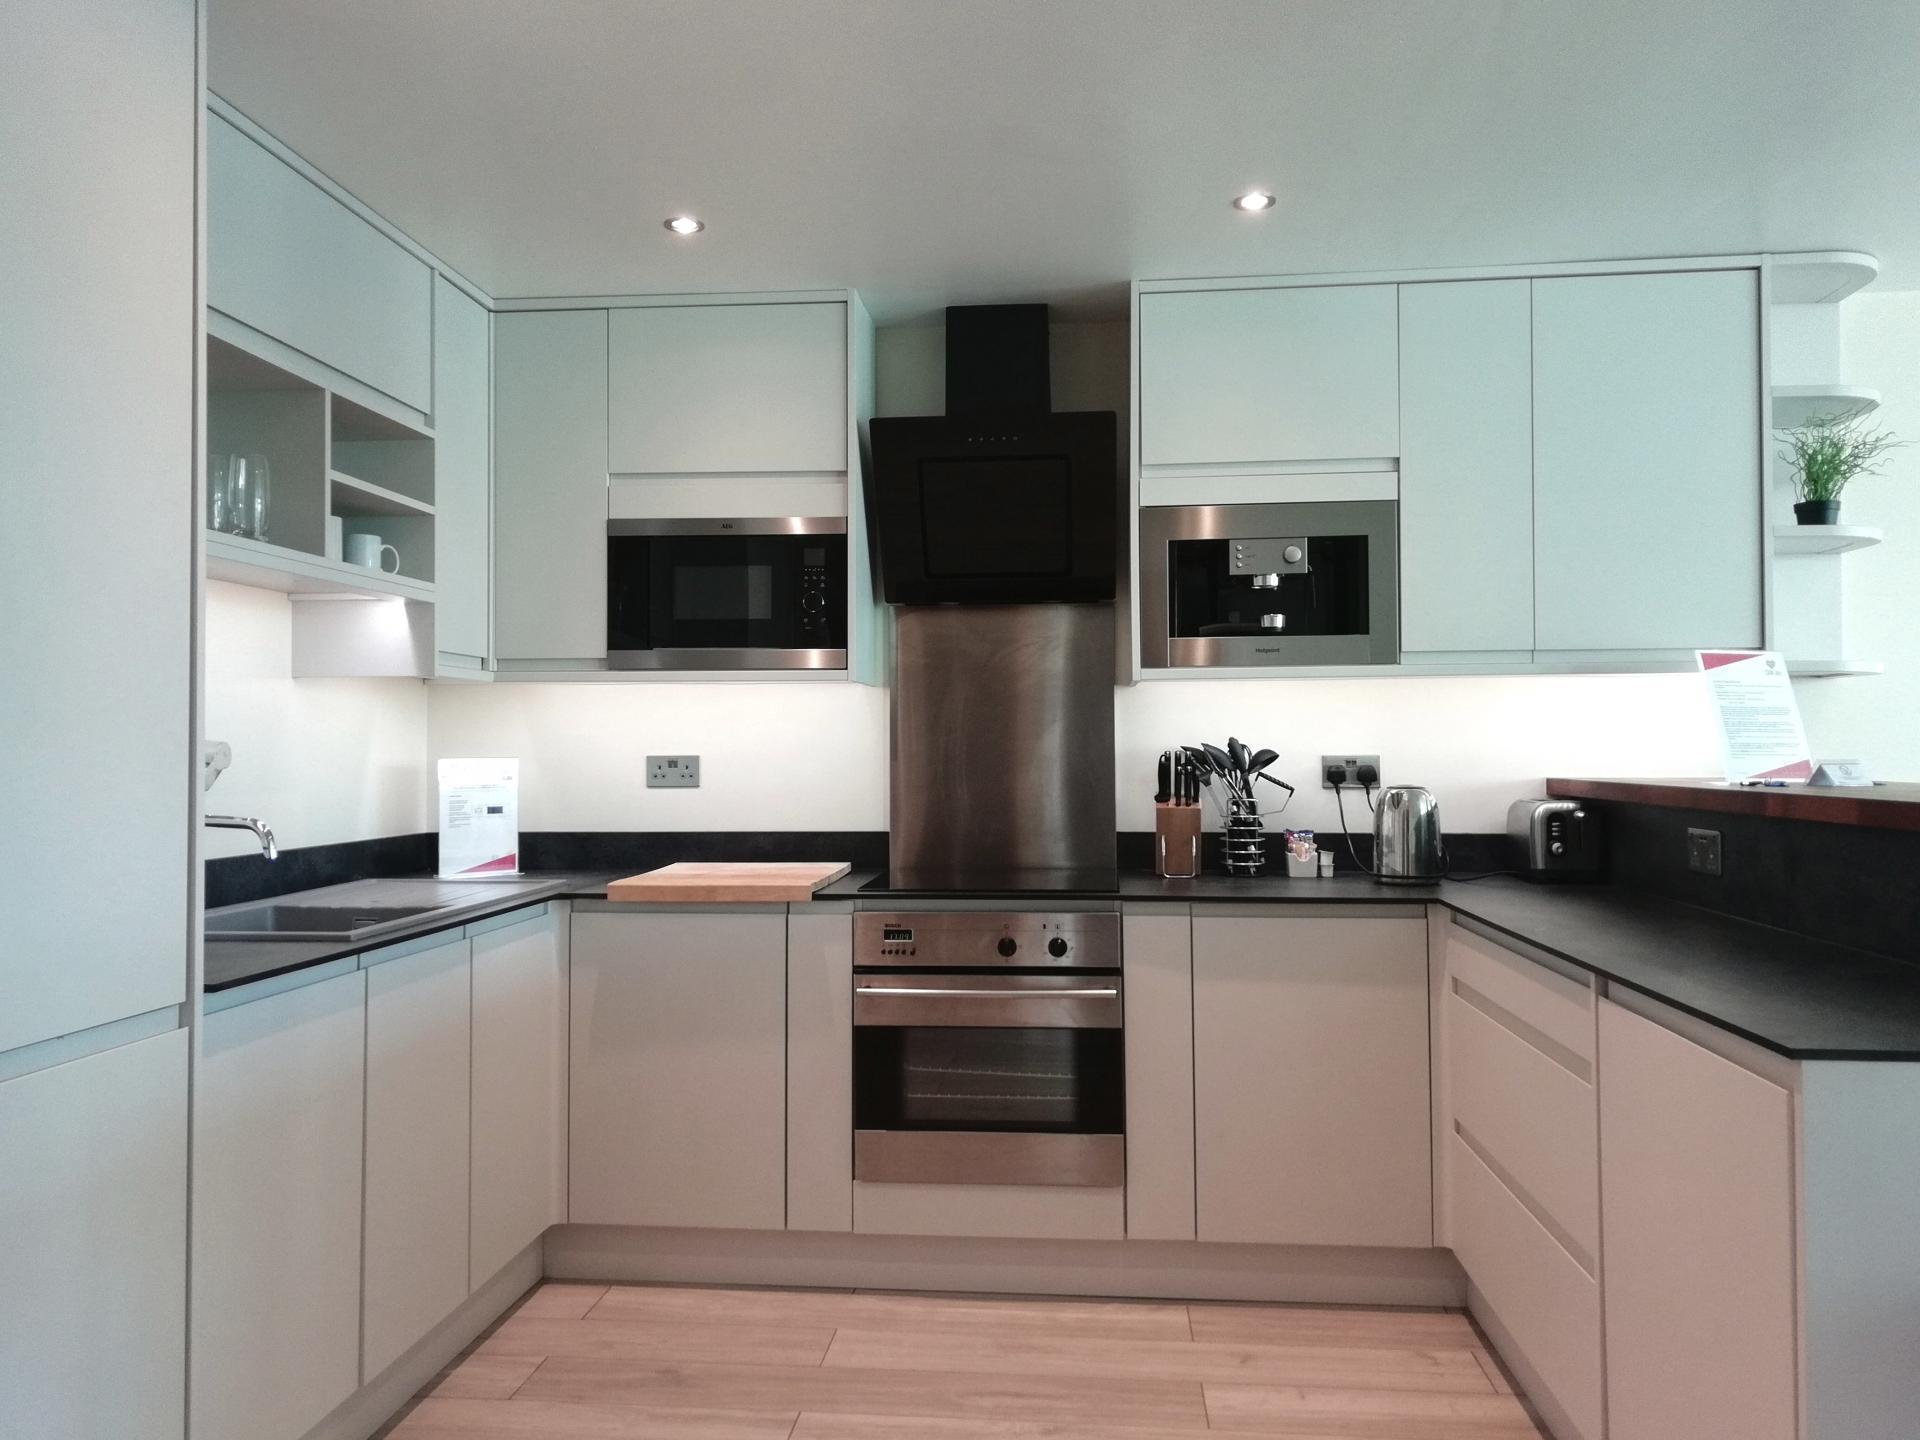 Kitchen at Still Life Vauxhall, Vauxhall, London - Citybase Apartments